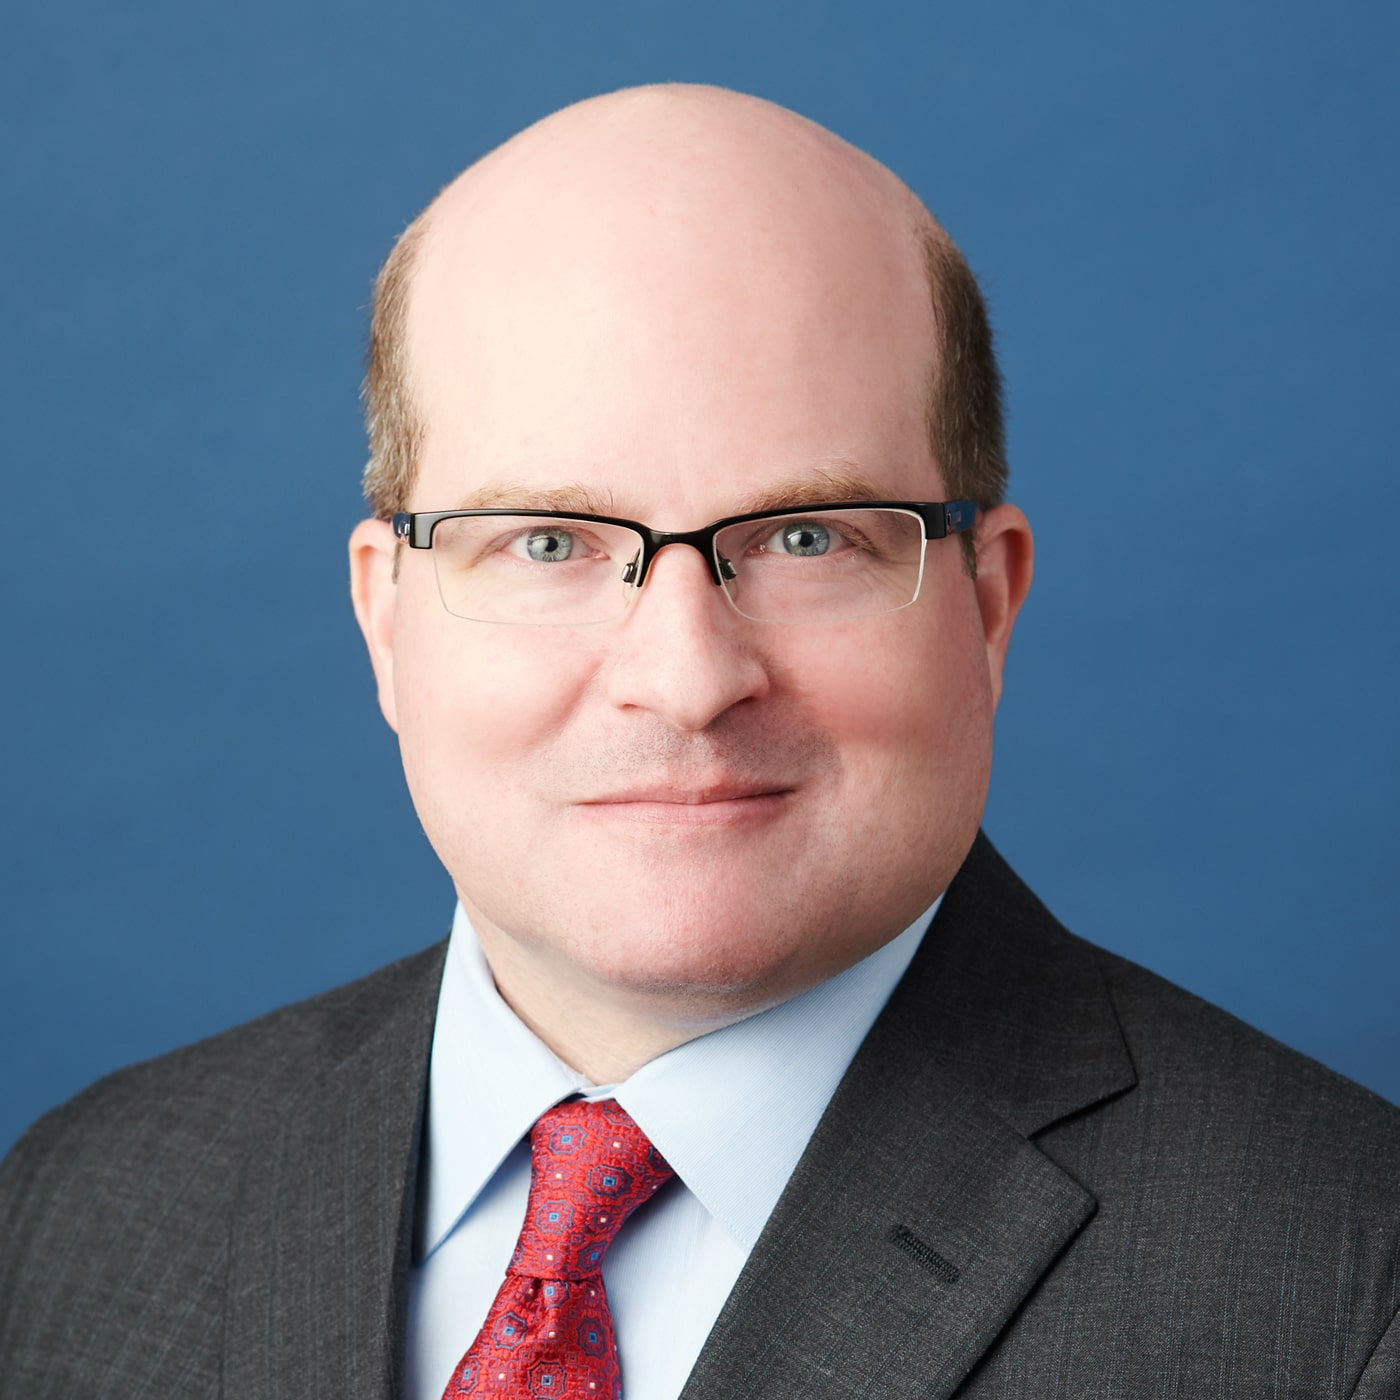 Joshua S. Roffman, Managing Attorney